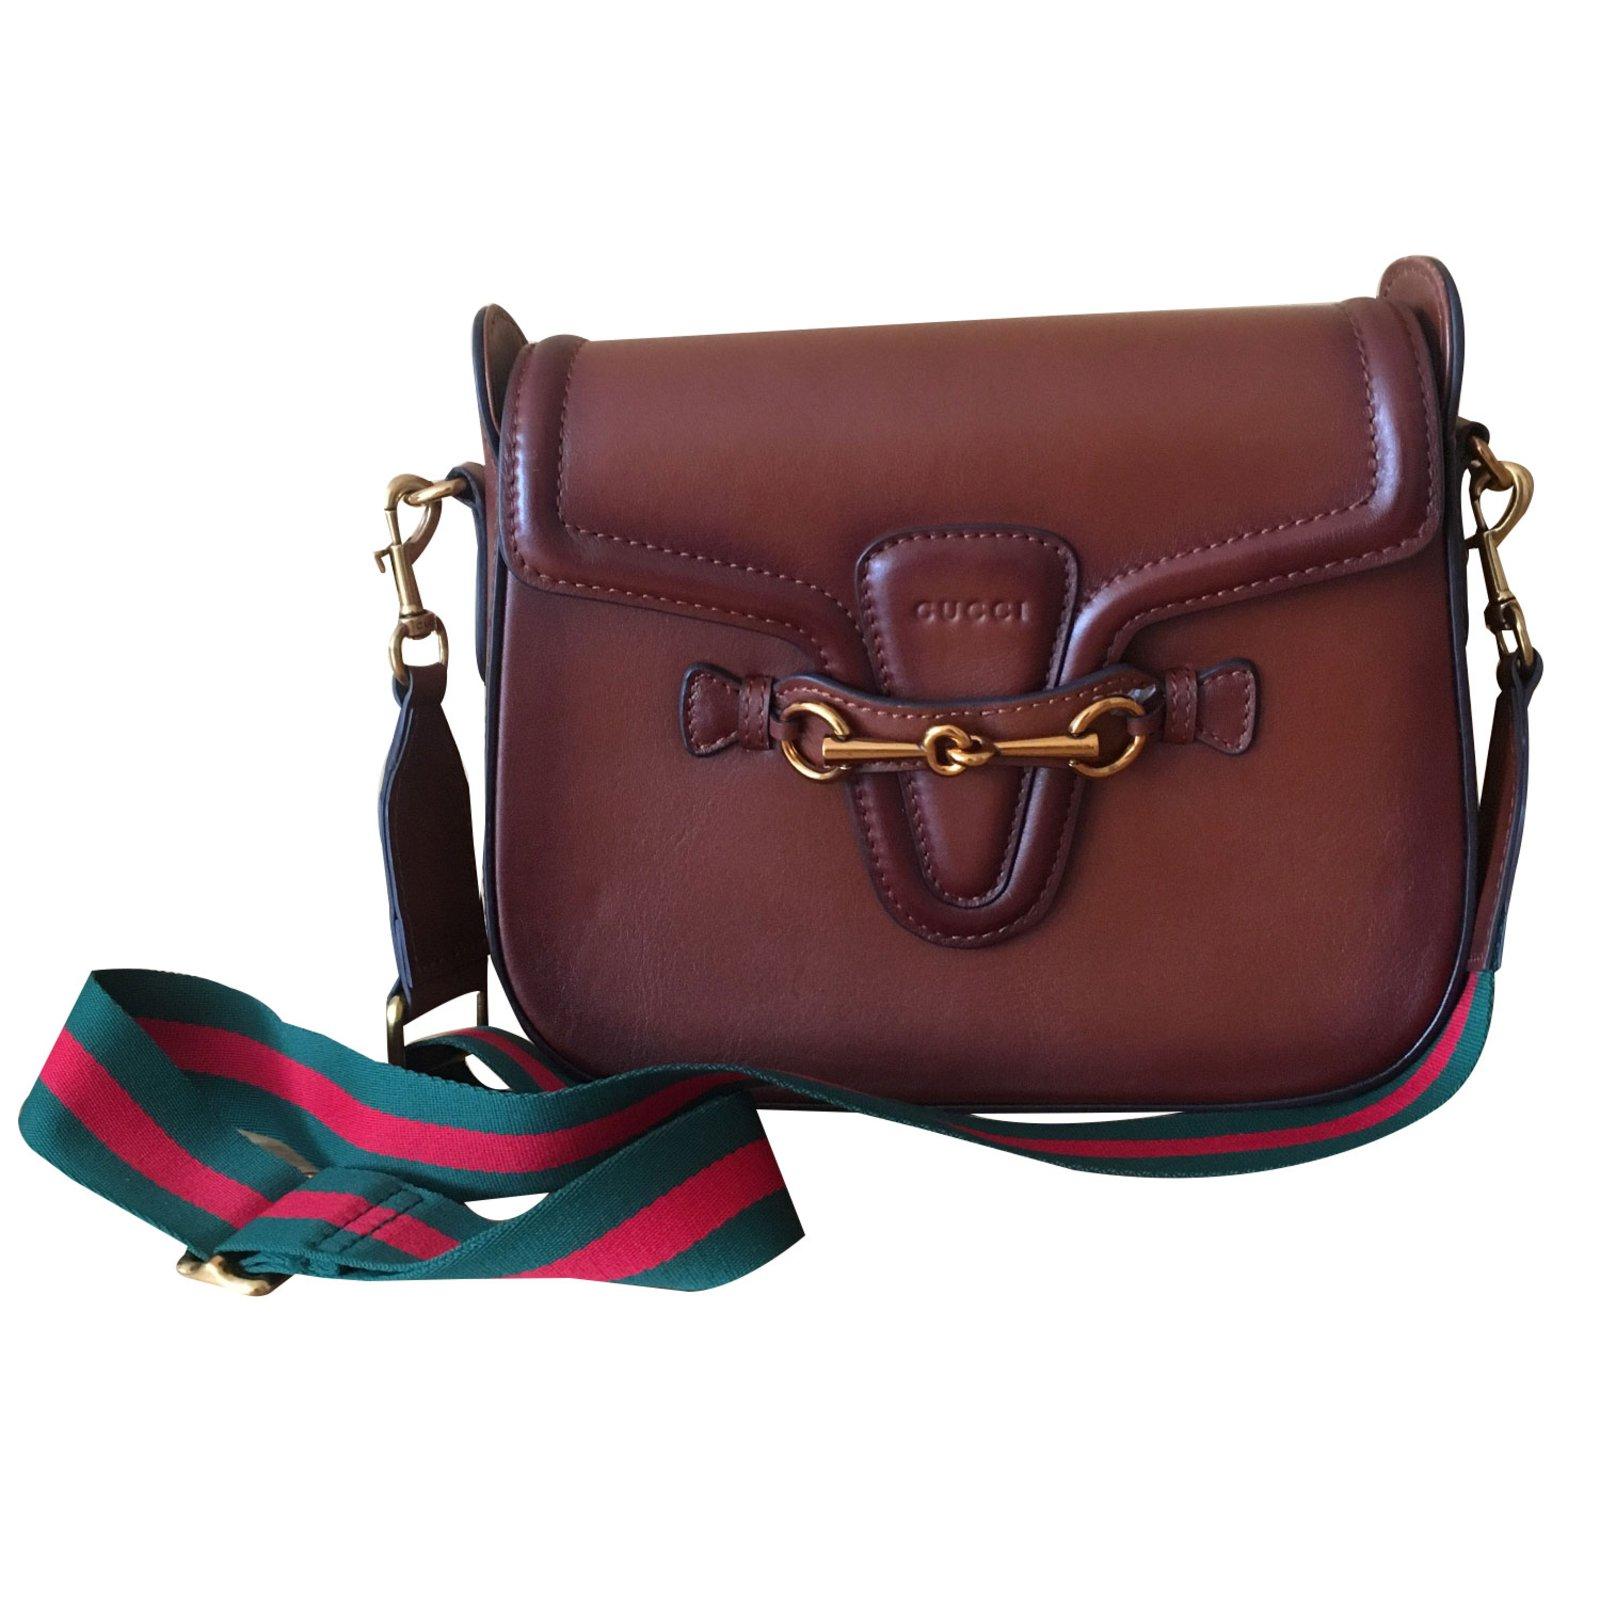 Gucci Lady Web Handbags Leather Brown Ref 87915 Joli Closet